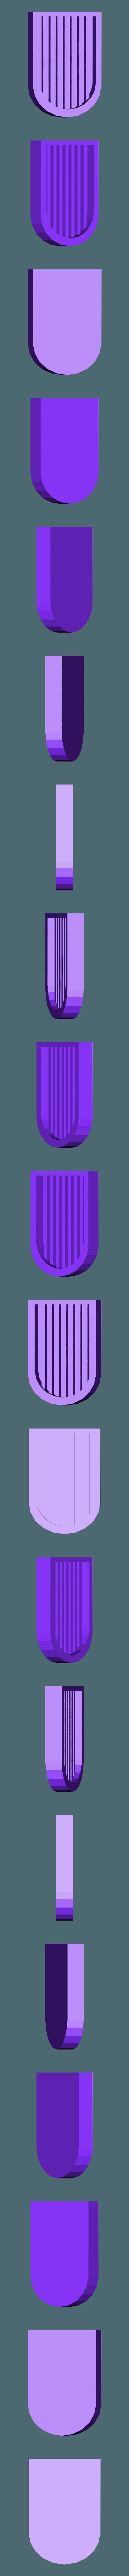 Old_Car_Radiator.stl Download free STL file Gaslands Greebles (Blowers and Burners) • Design to 3D print, Ellie_Valkyrie